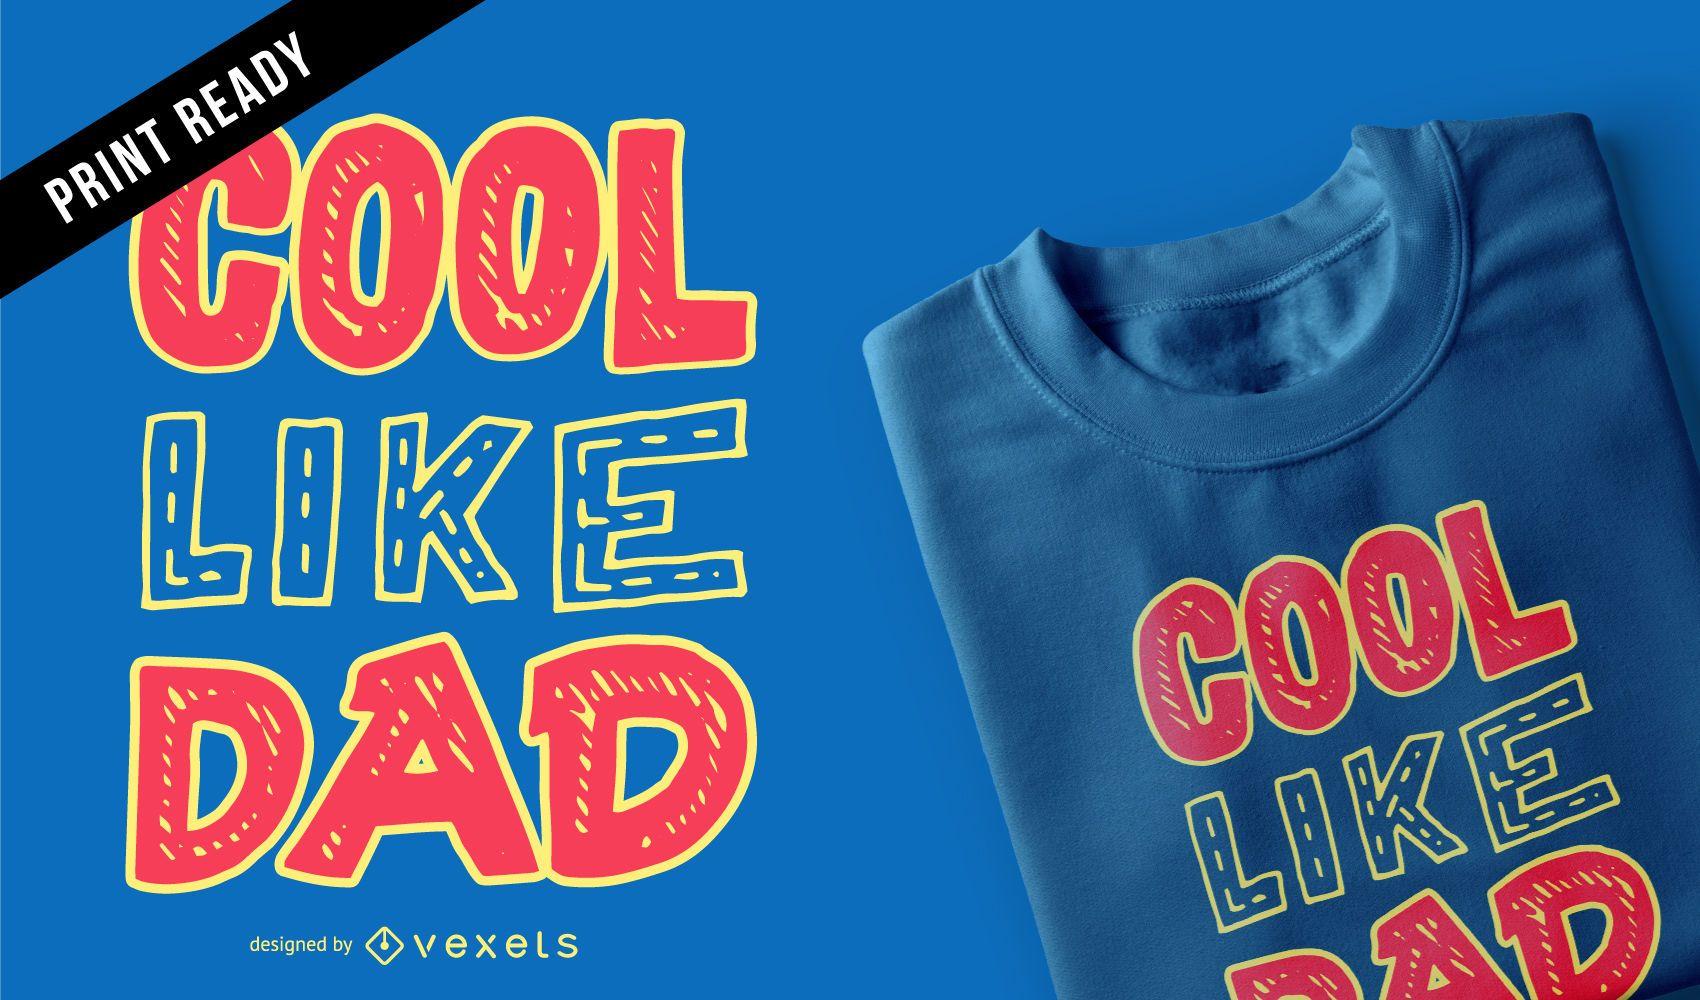 Cool dad kids t-shirt design